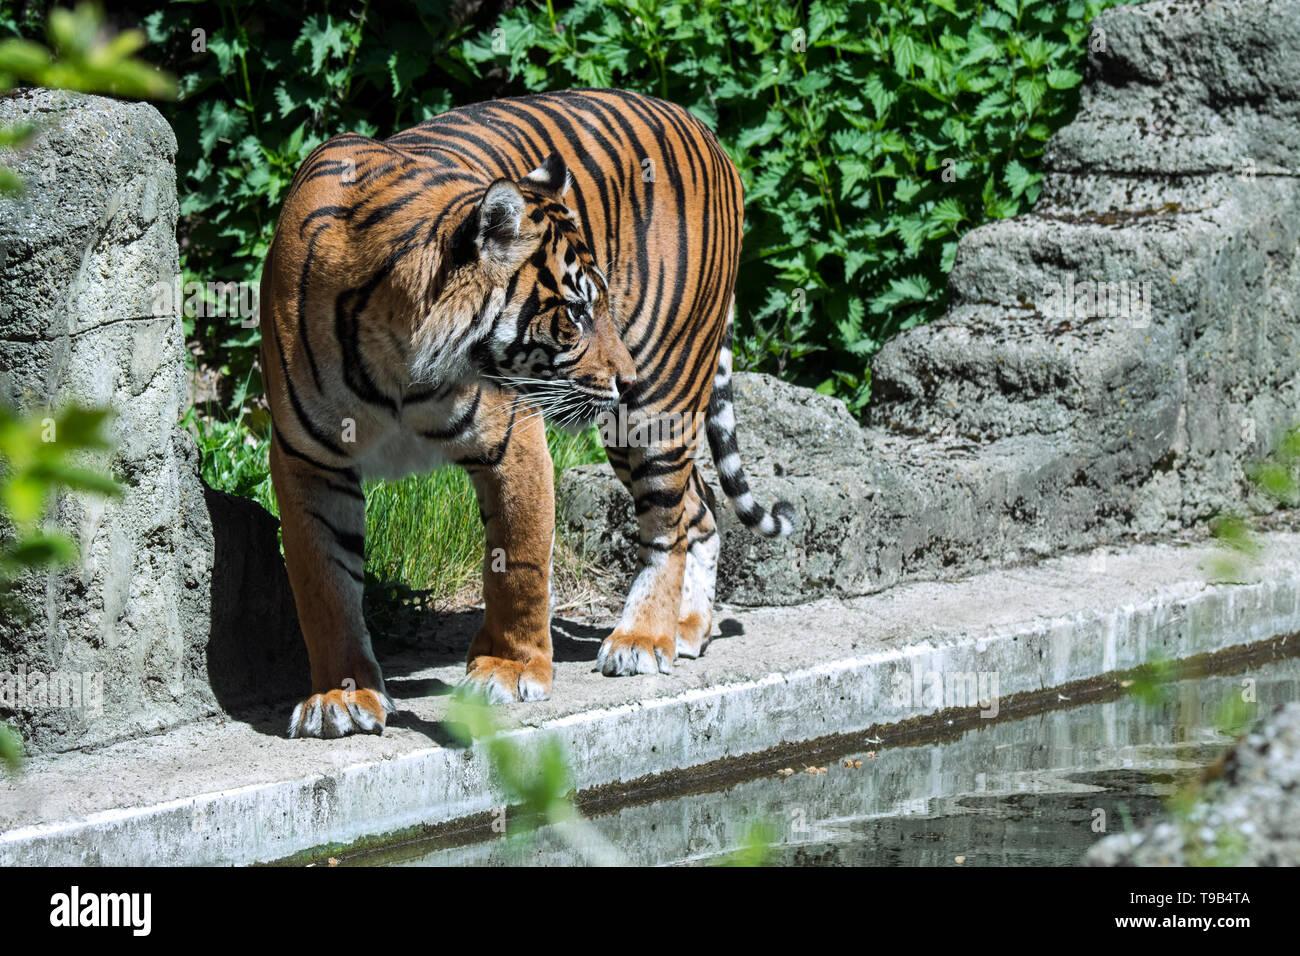 Sumatran tiger (Panthera tigris sondaica) native to Sumatra, Indonesia - Stock Image